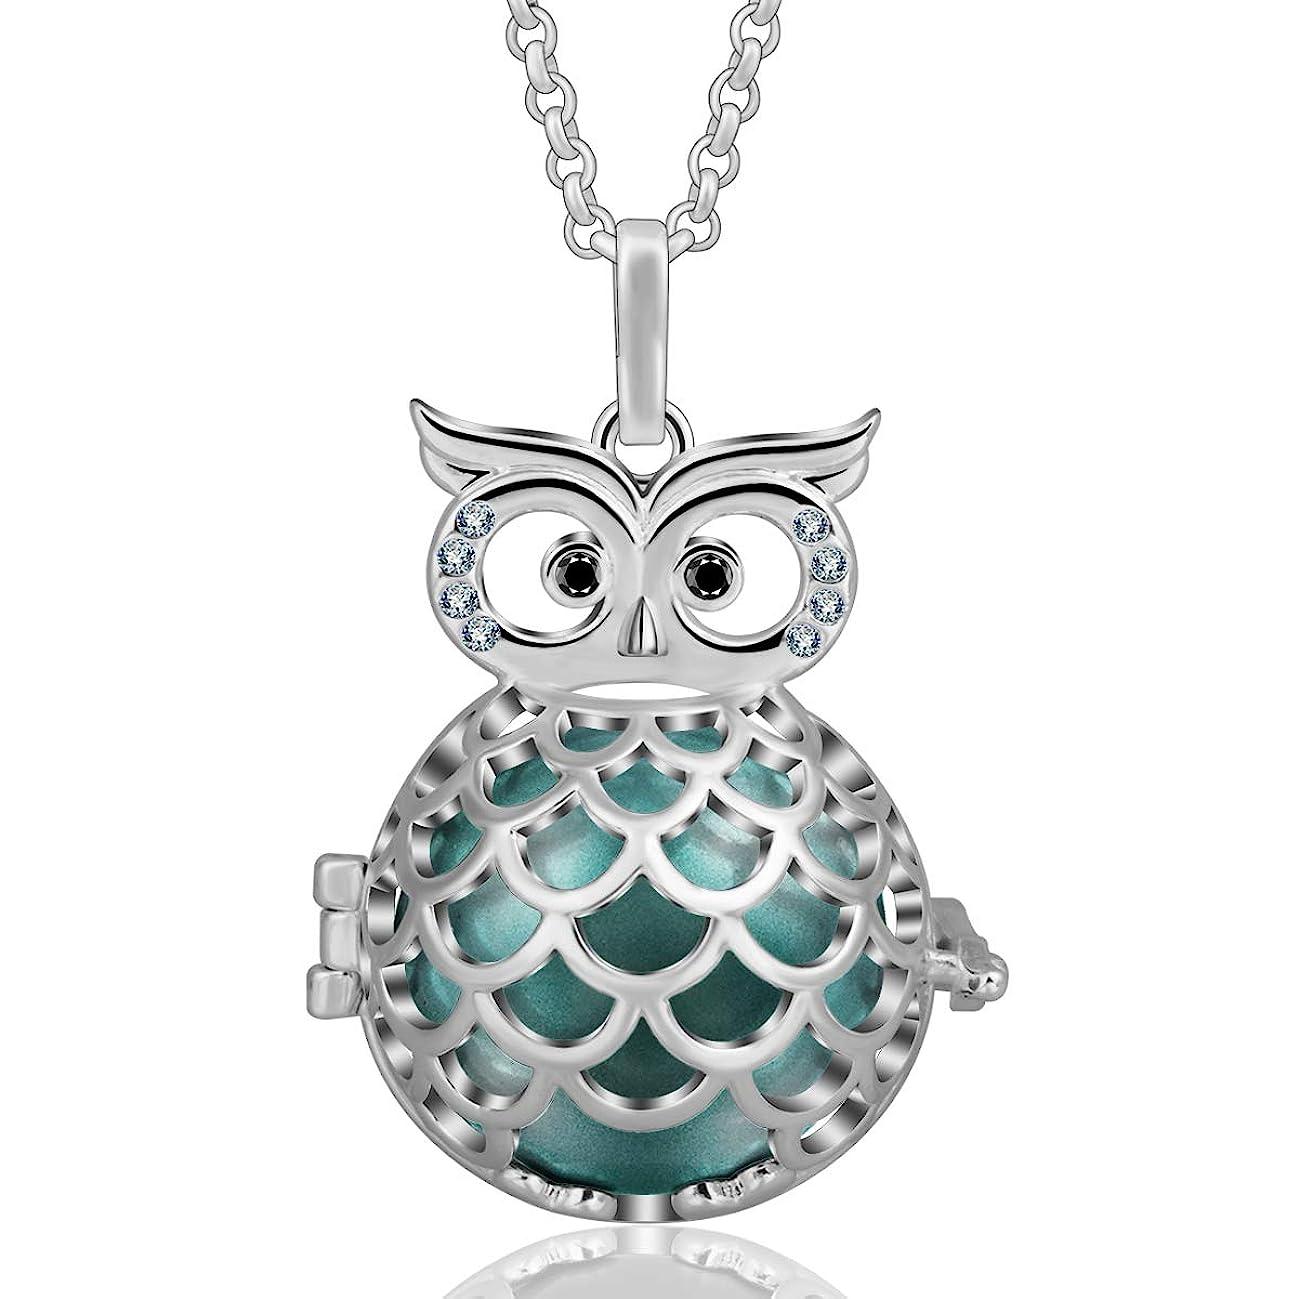 EUDORA Harmony Ball Wise Owl 20mm Pendant Pregnancy Long Necklace Mexico Bola Chime 45